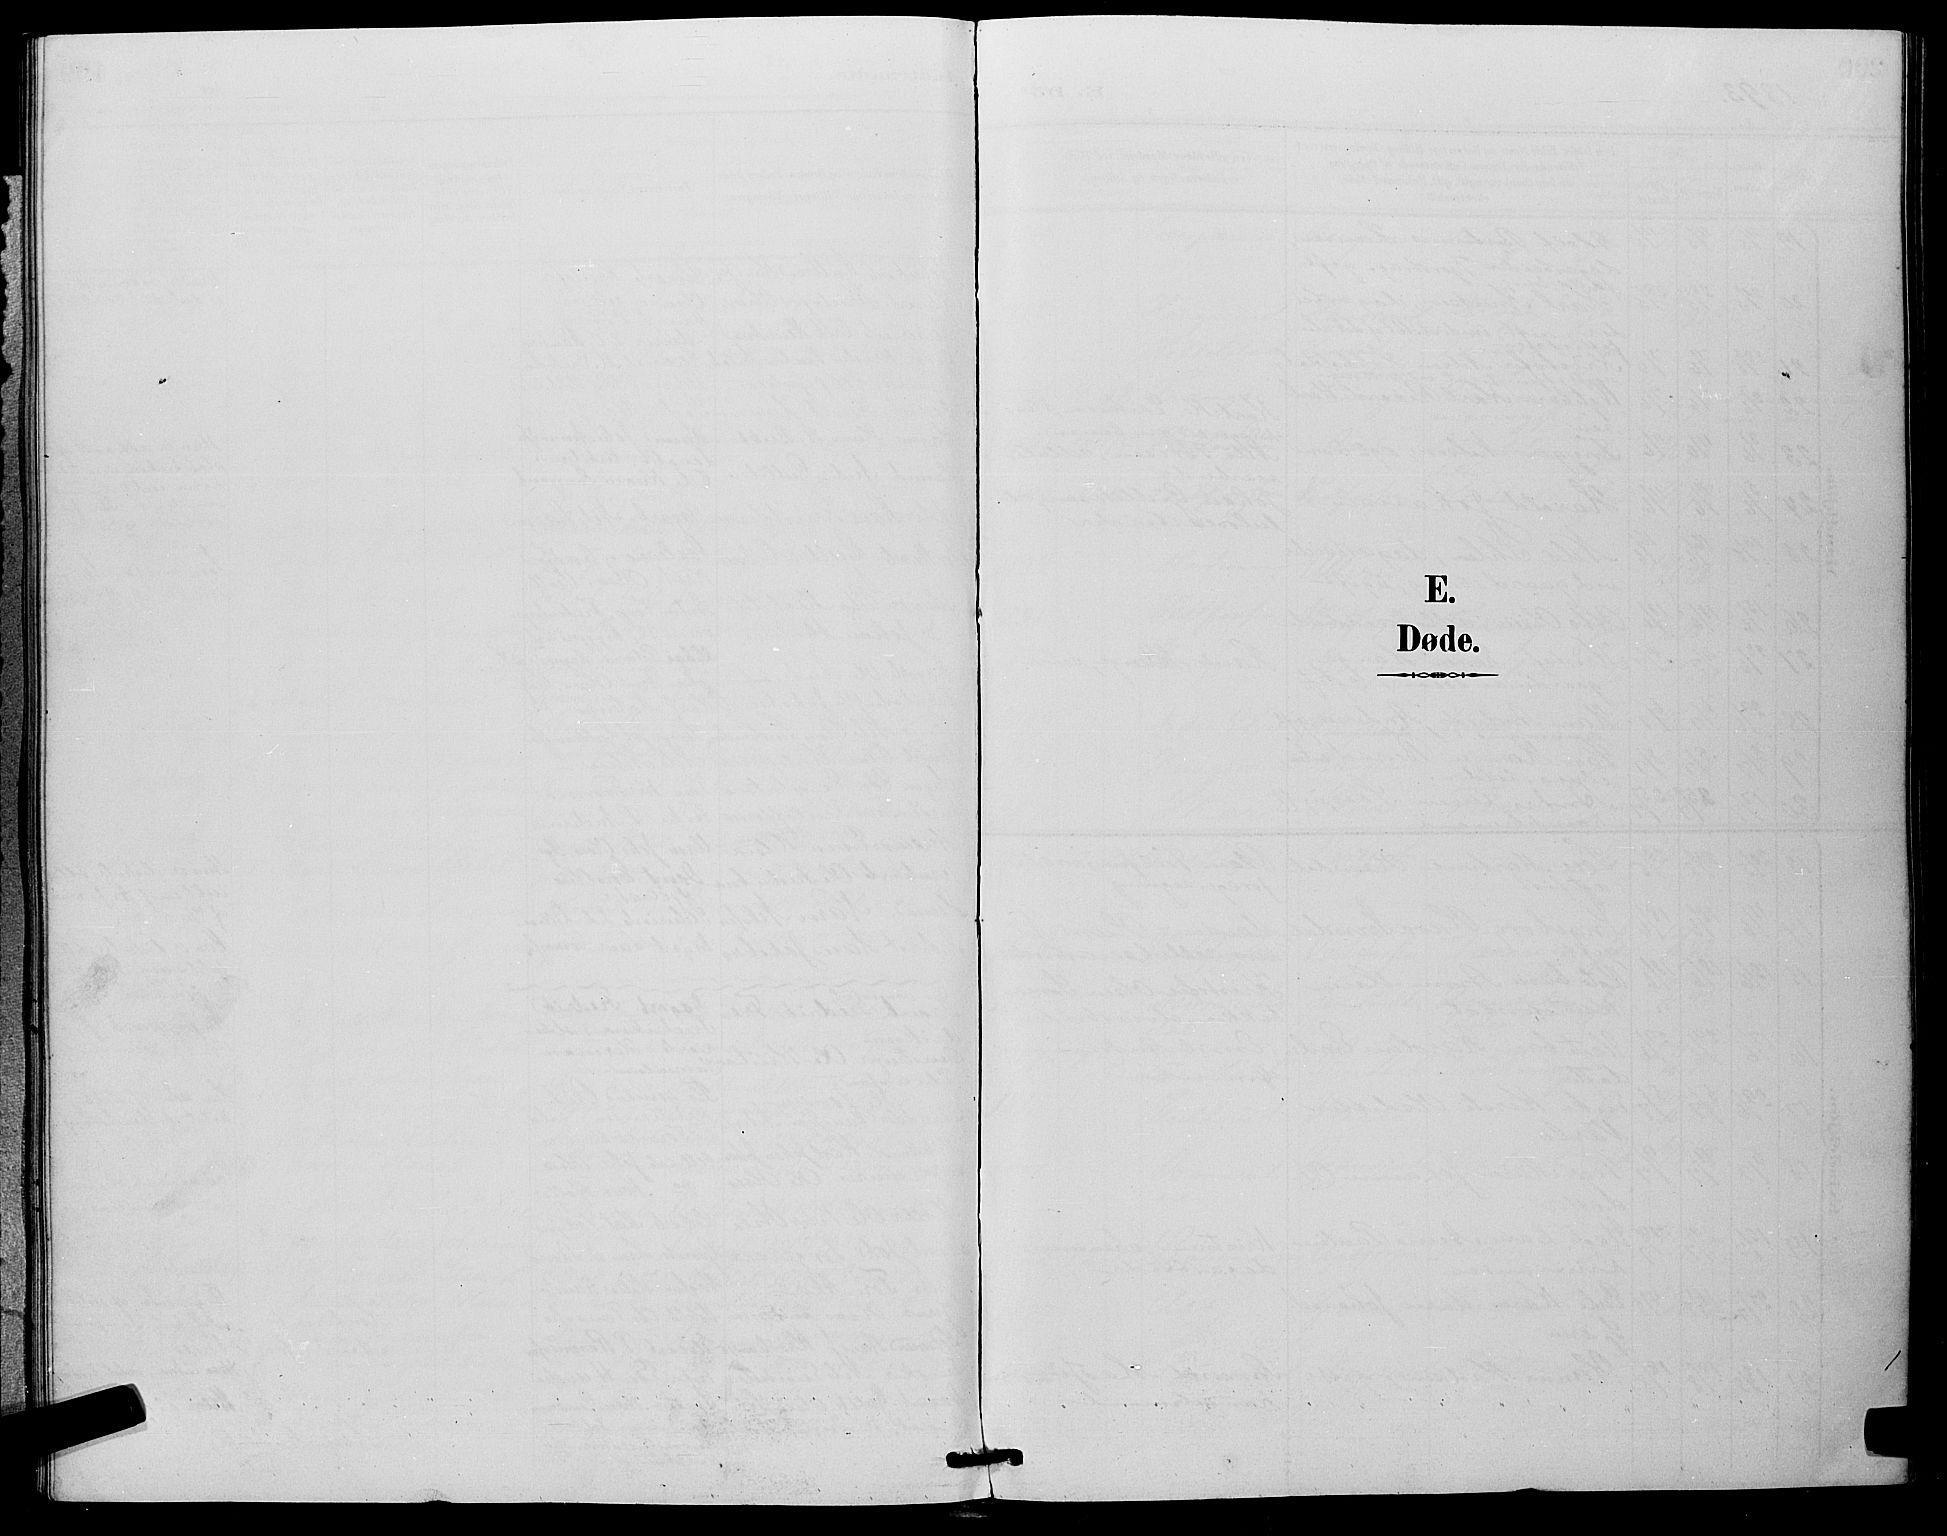 SAKO, Eiker kirkebøker, G/Ga/L0007: Parish register (copy) no. I 7, 1893-1902